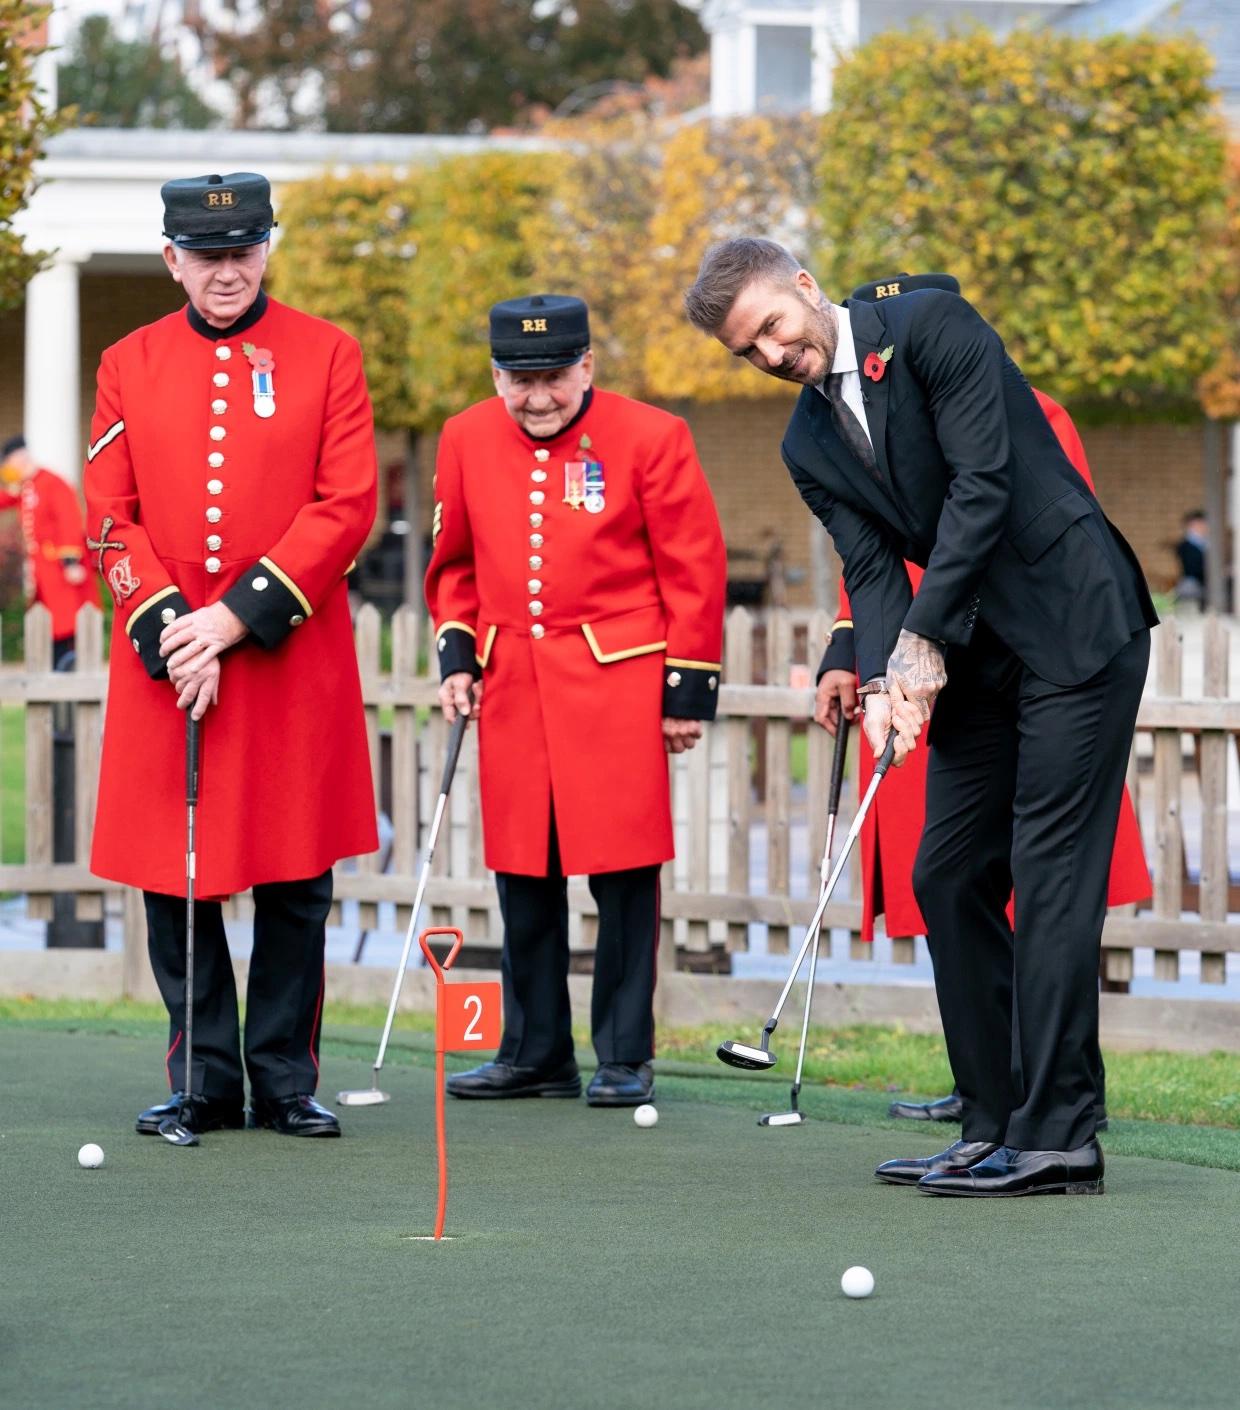 David Beckham shows off his putting skills